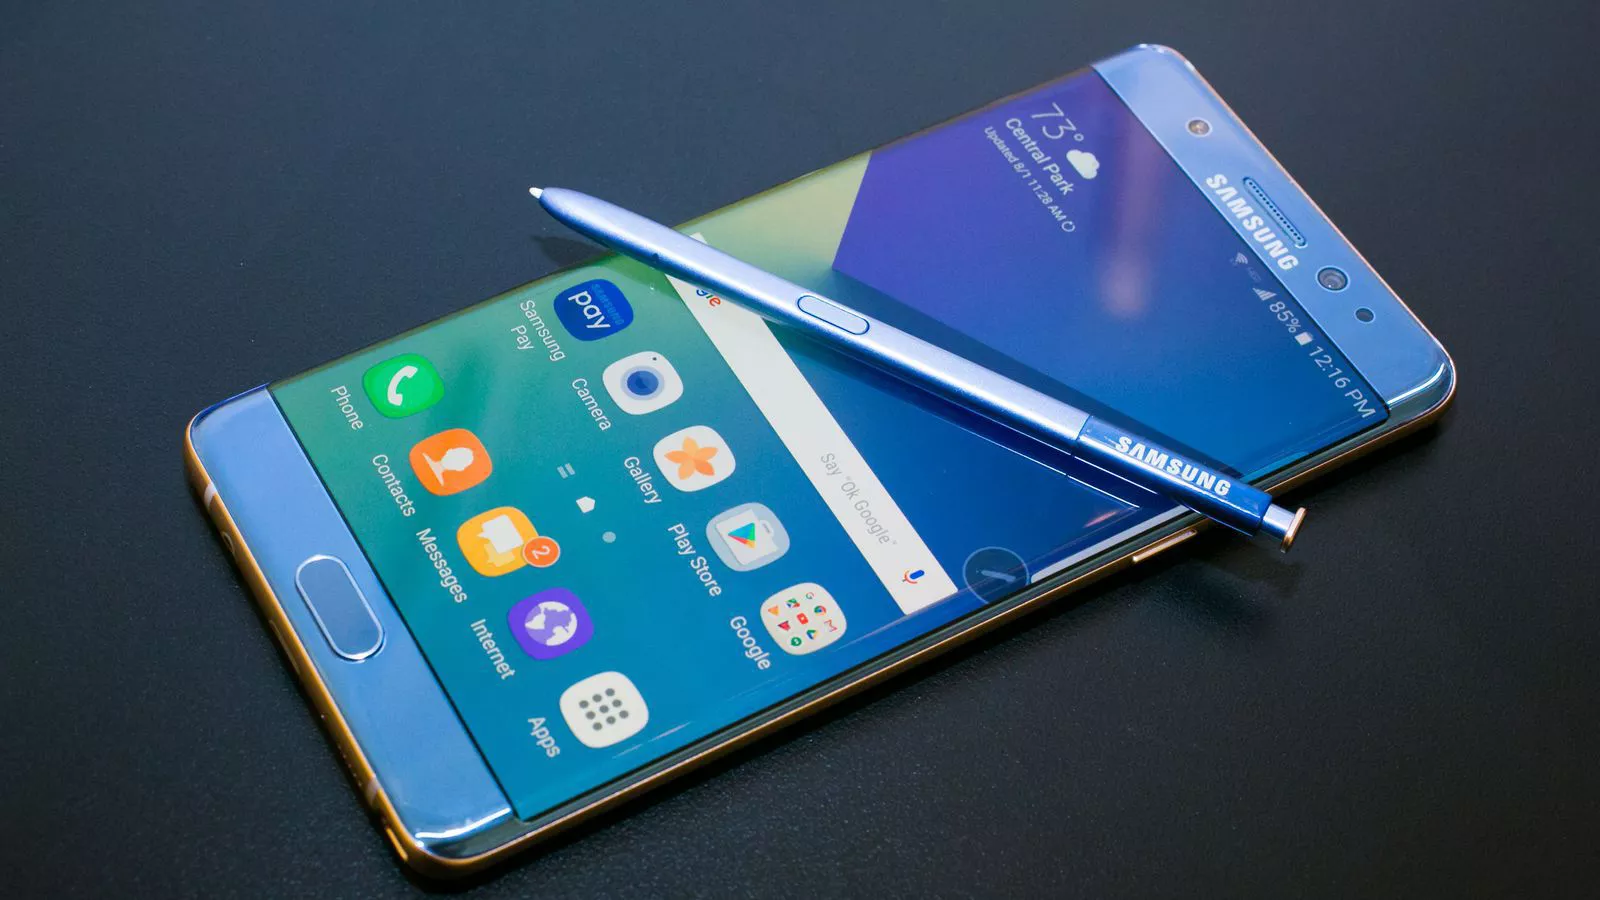 Sửa chữa điện thoại Samsung Galaxy Note FE